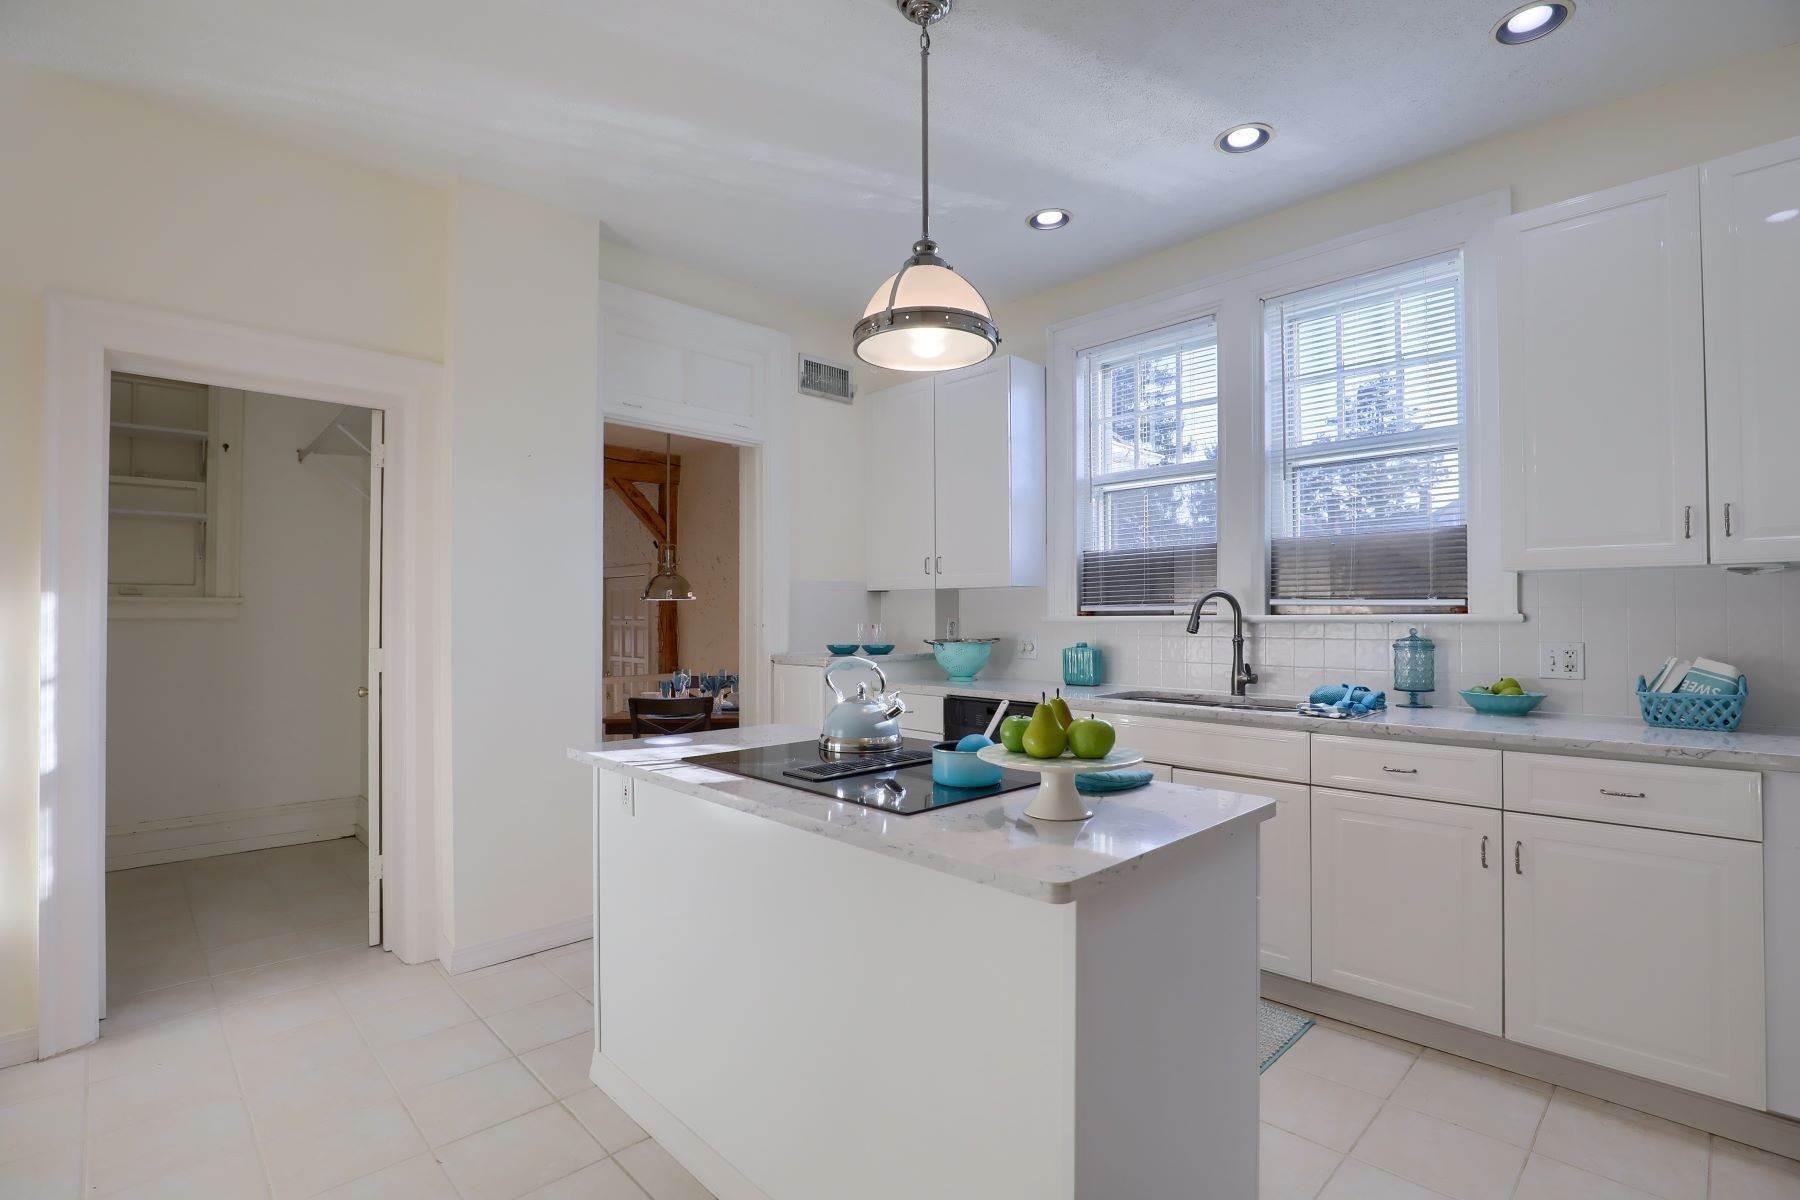 4. Single Family Homes for Sale at 206 E Granada Ave Hershey, Pennsylvania 17033 United States